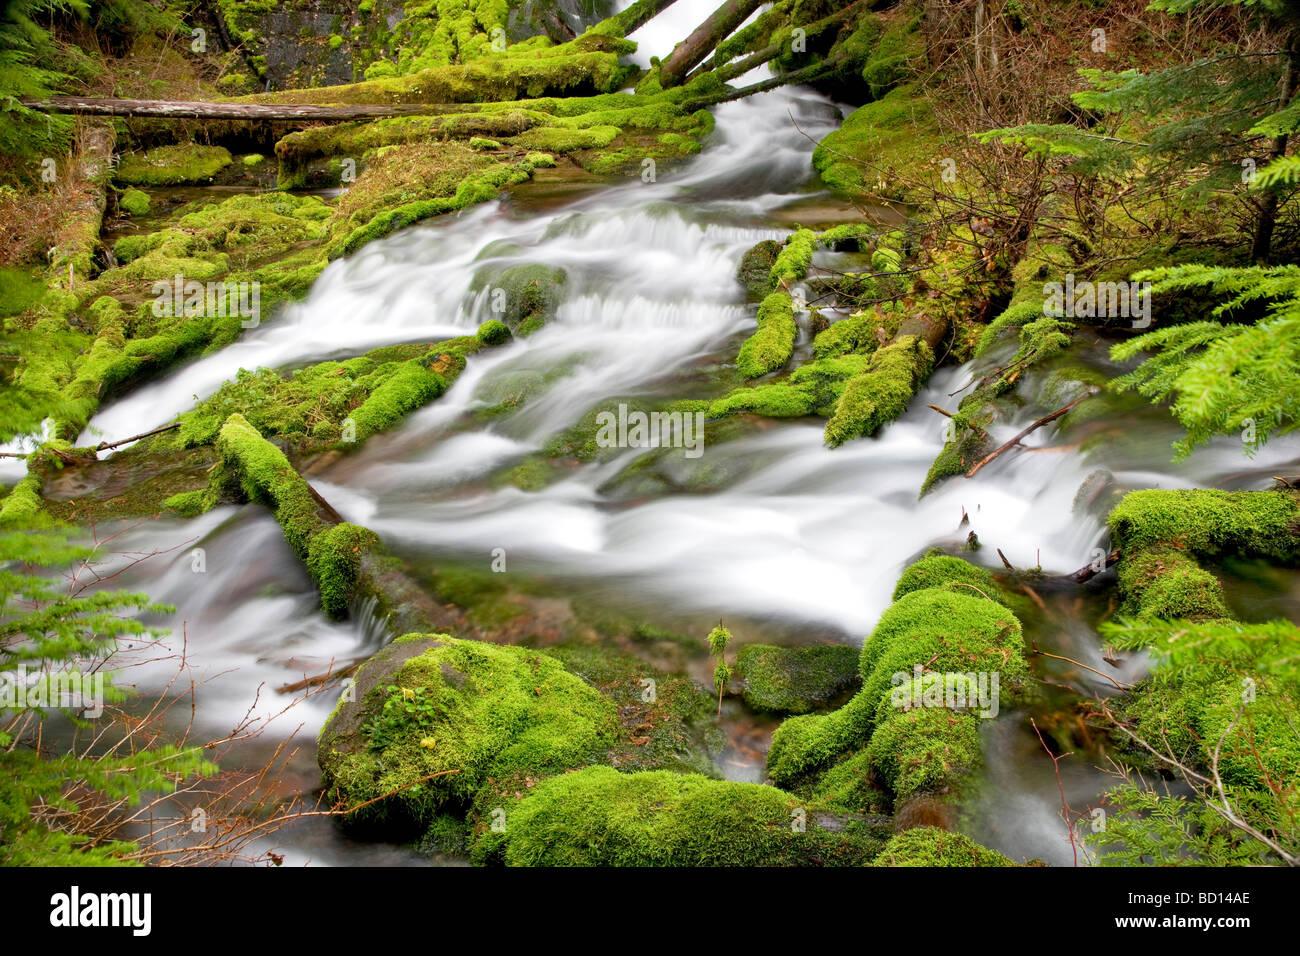 Big Spring Creek con rocas musgosas Gifford Pinchot National Forest Washington Imagen De Stock